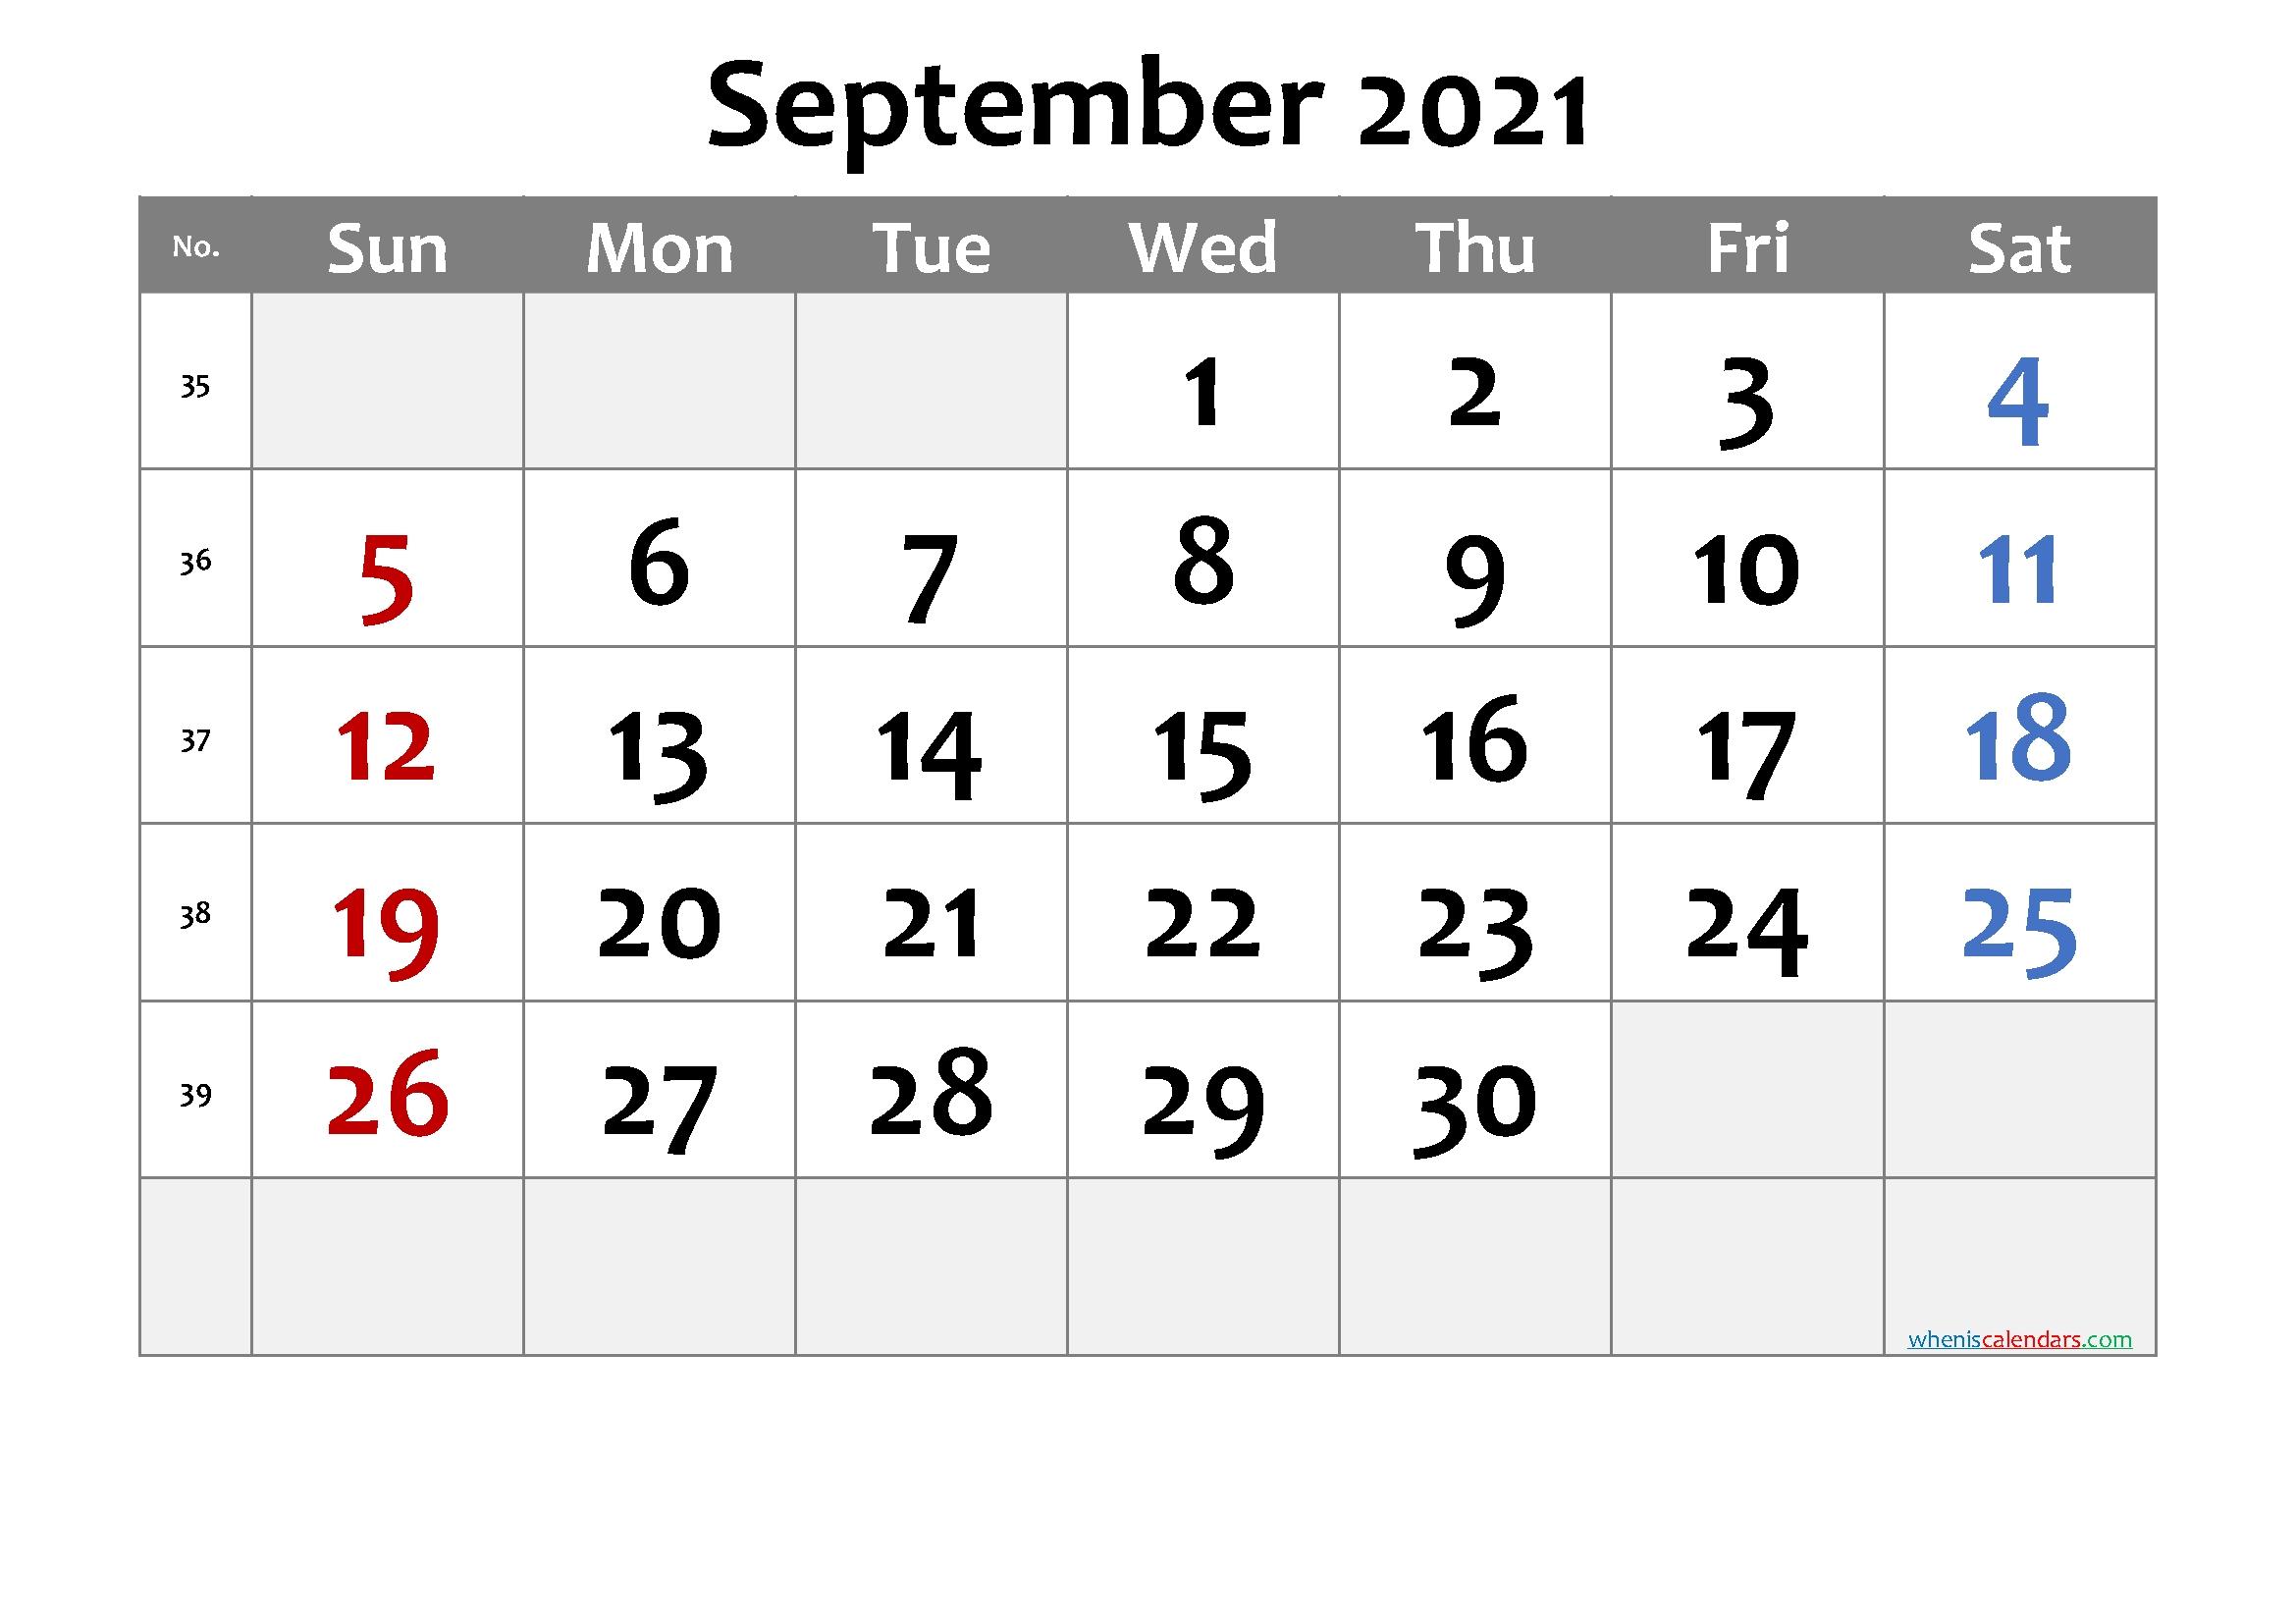 Printable September 2021 Calendar - 6 Templates | Free Printable 2020 Monthly Calendar With Holidays September 2021 Calendar With Holidays Printable